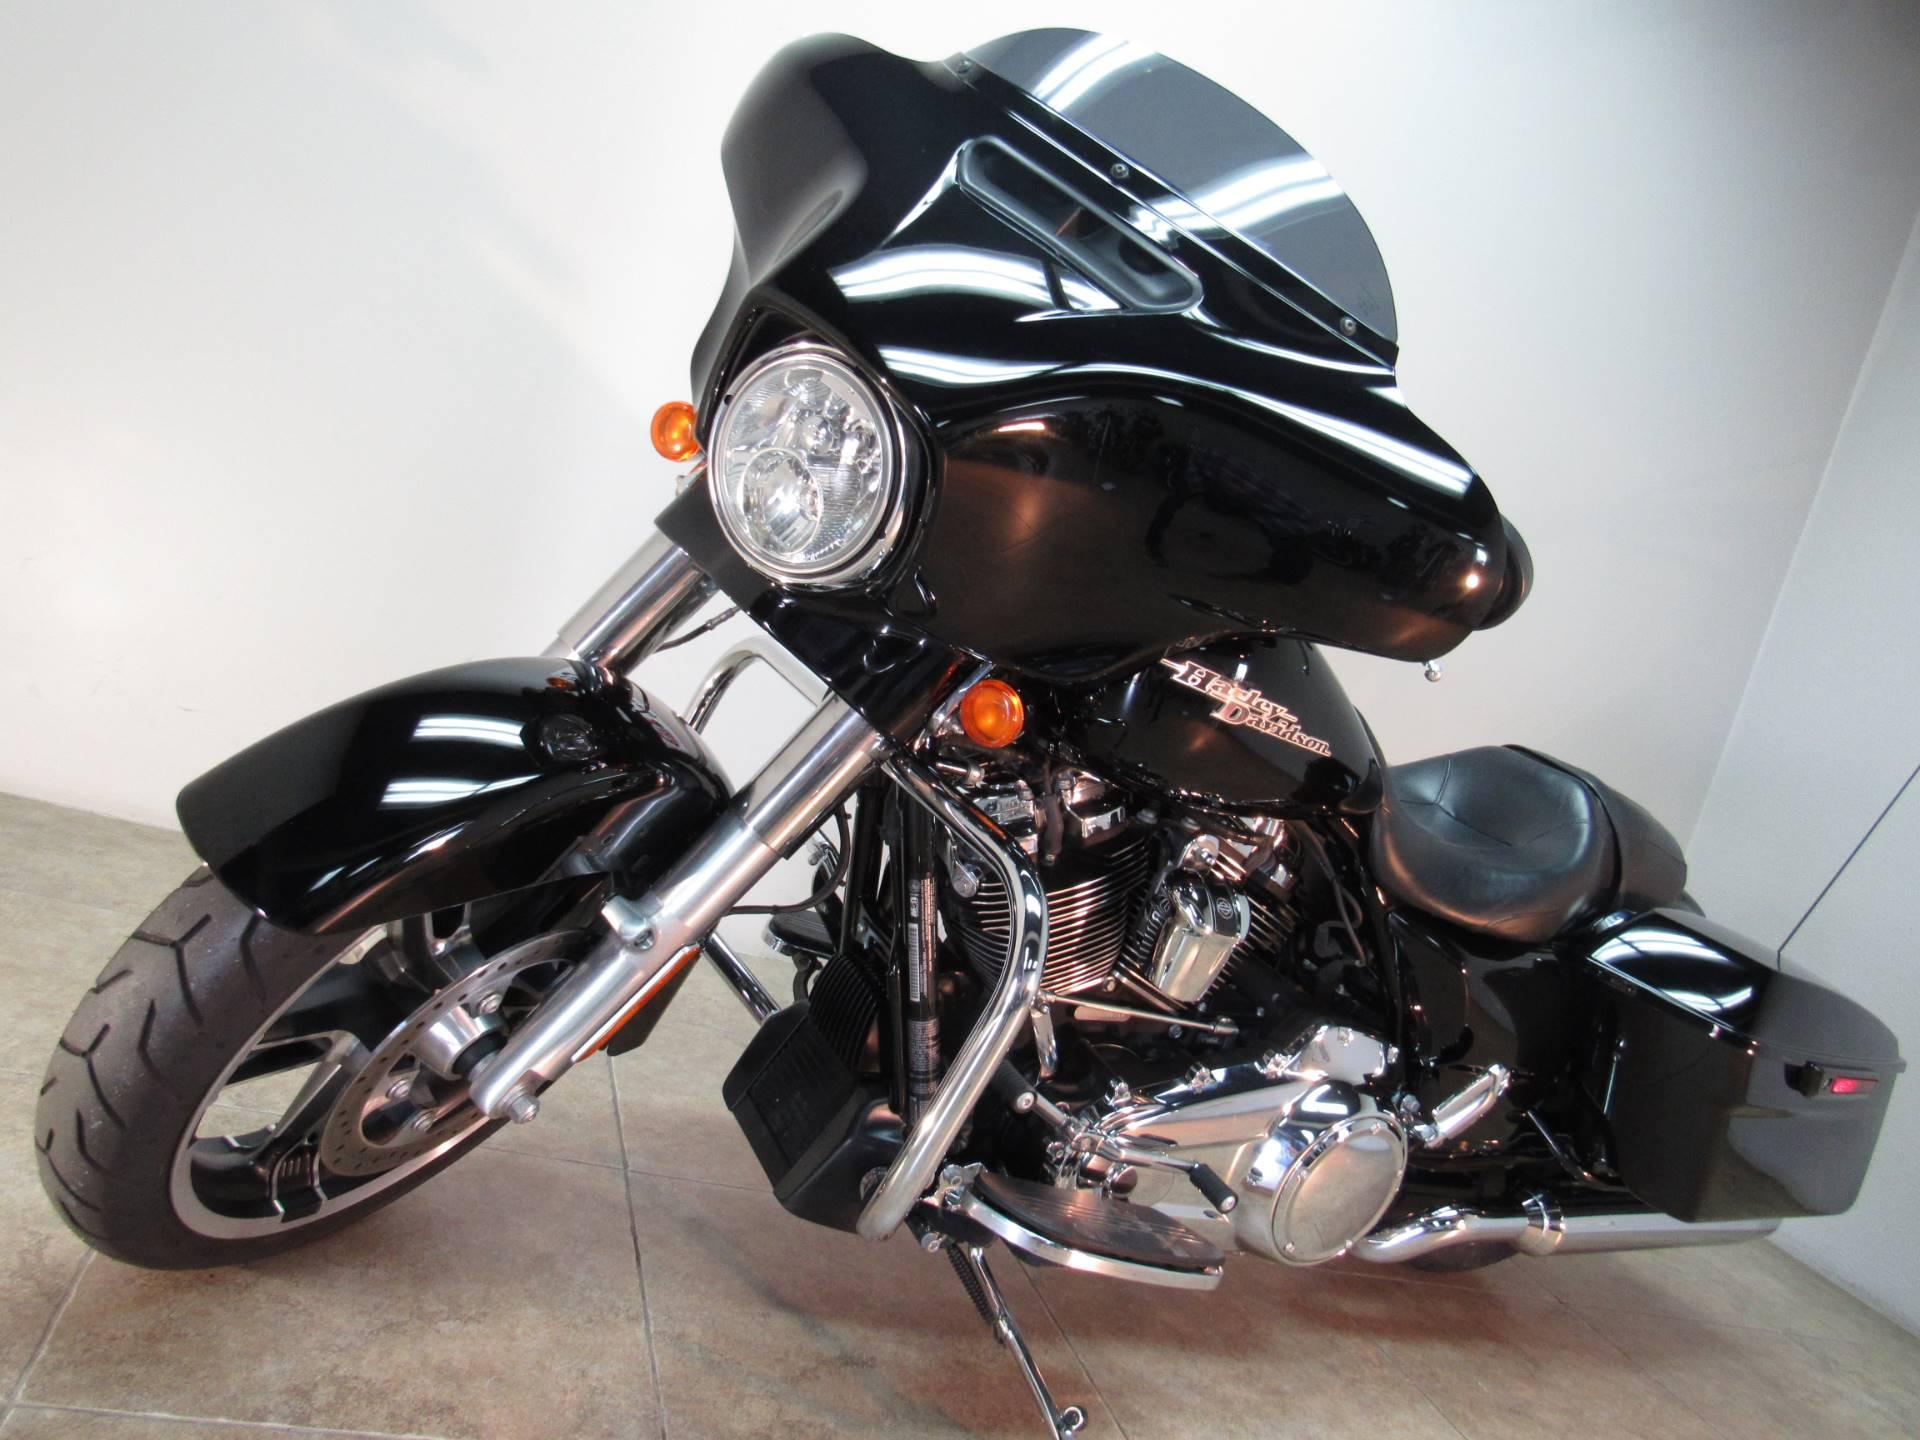 2017 Harley-Davidson Street Glide Special 8